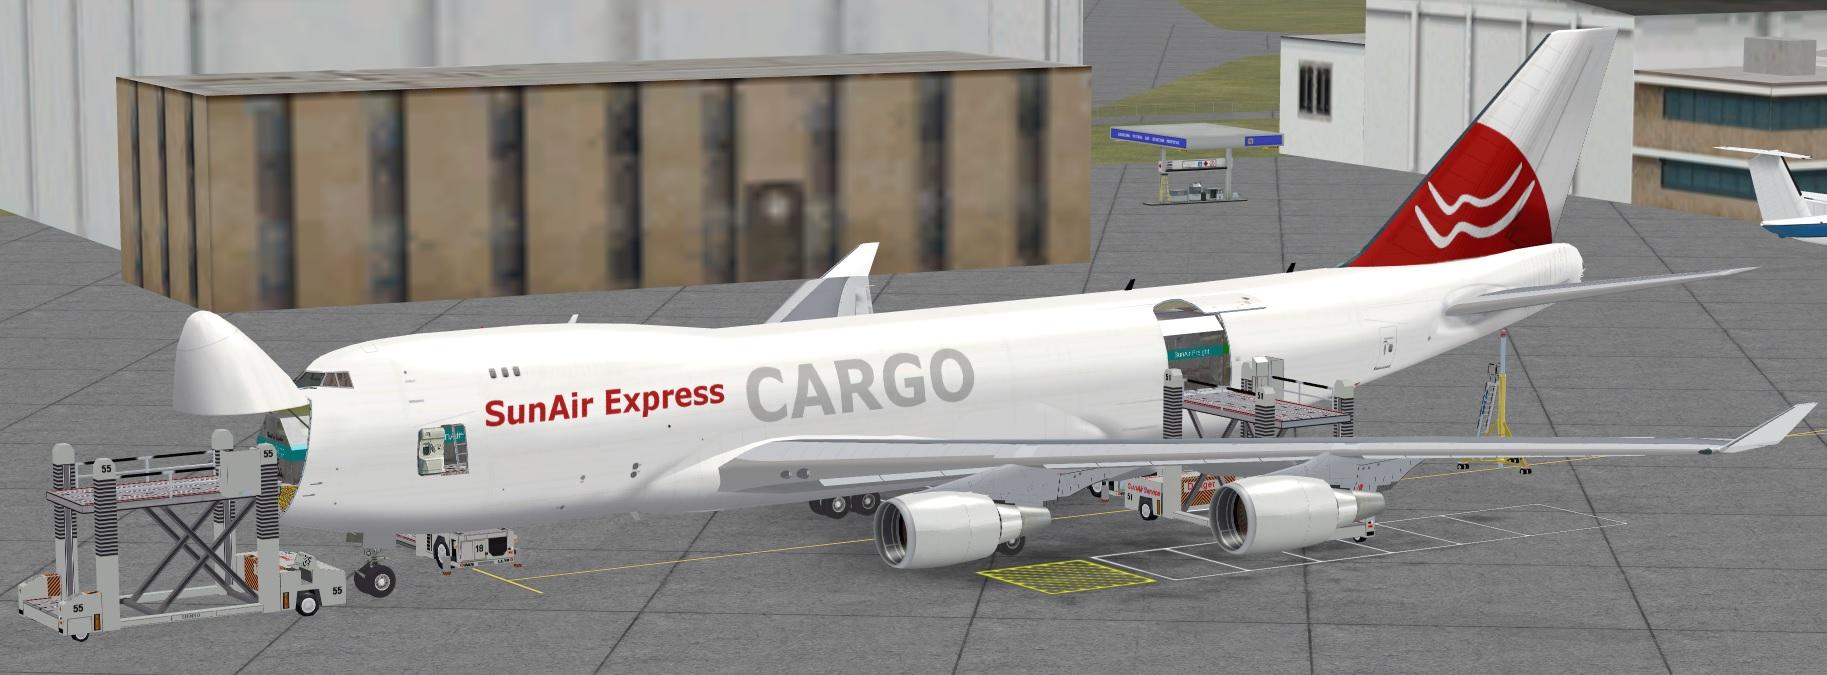 SunAir Express Virtual Airlines Operations Manual